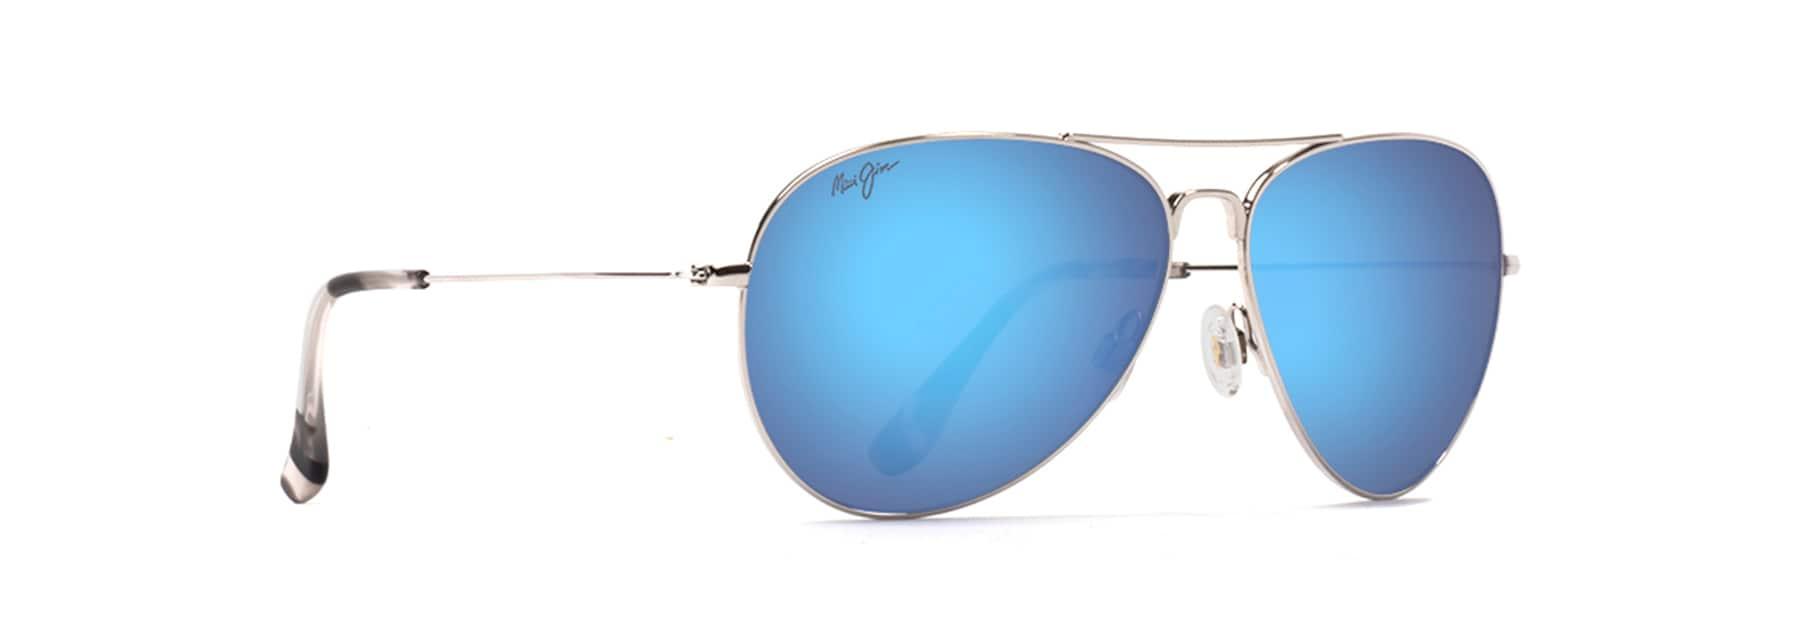 New Maverick Silver Square Aviator Sunglass with Gray Polarized Lens